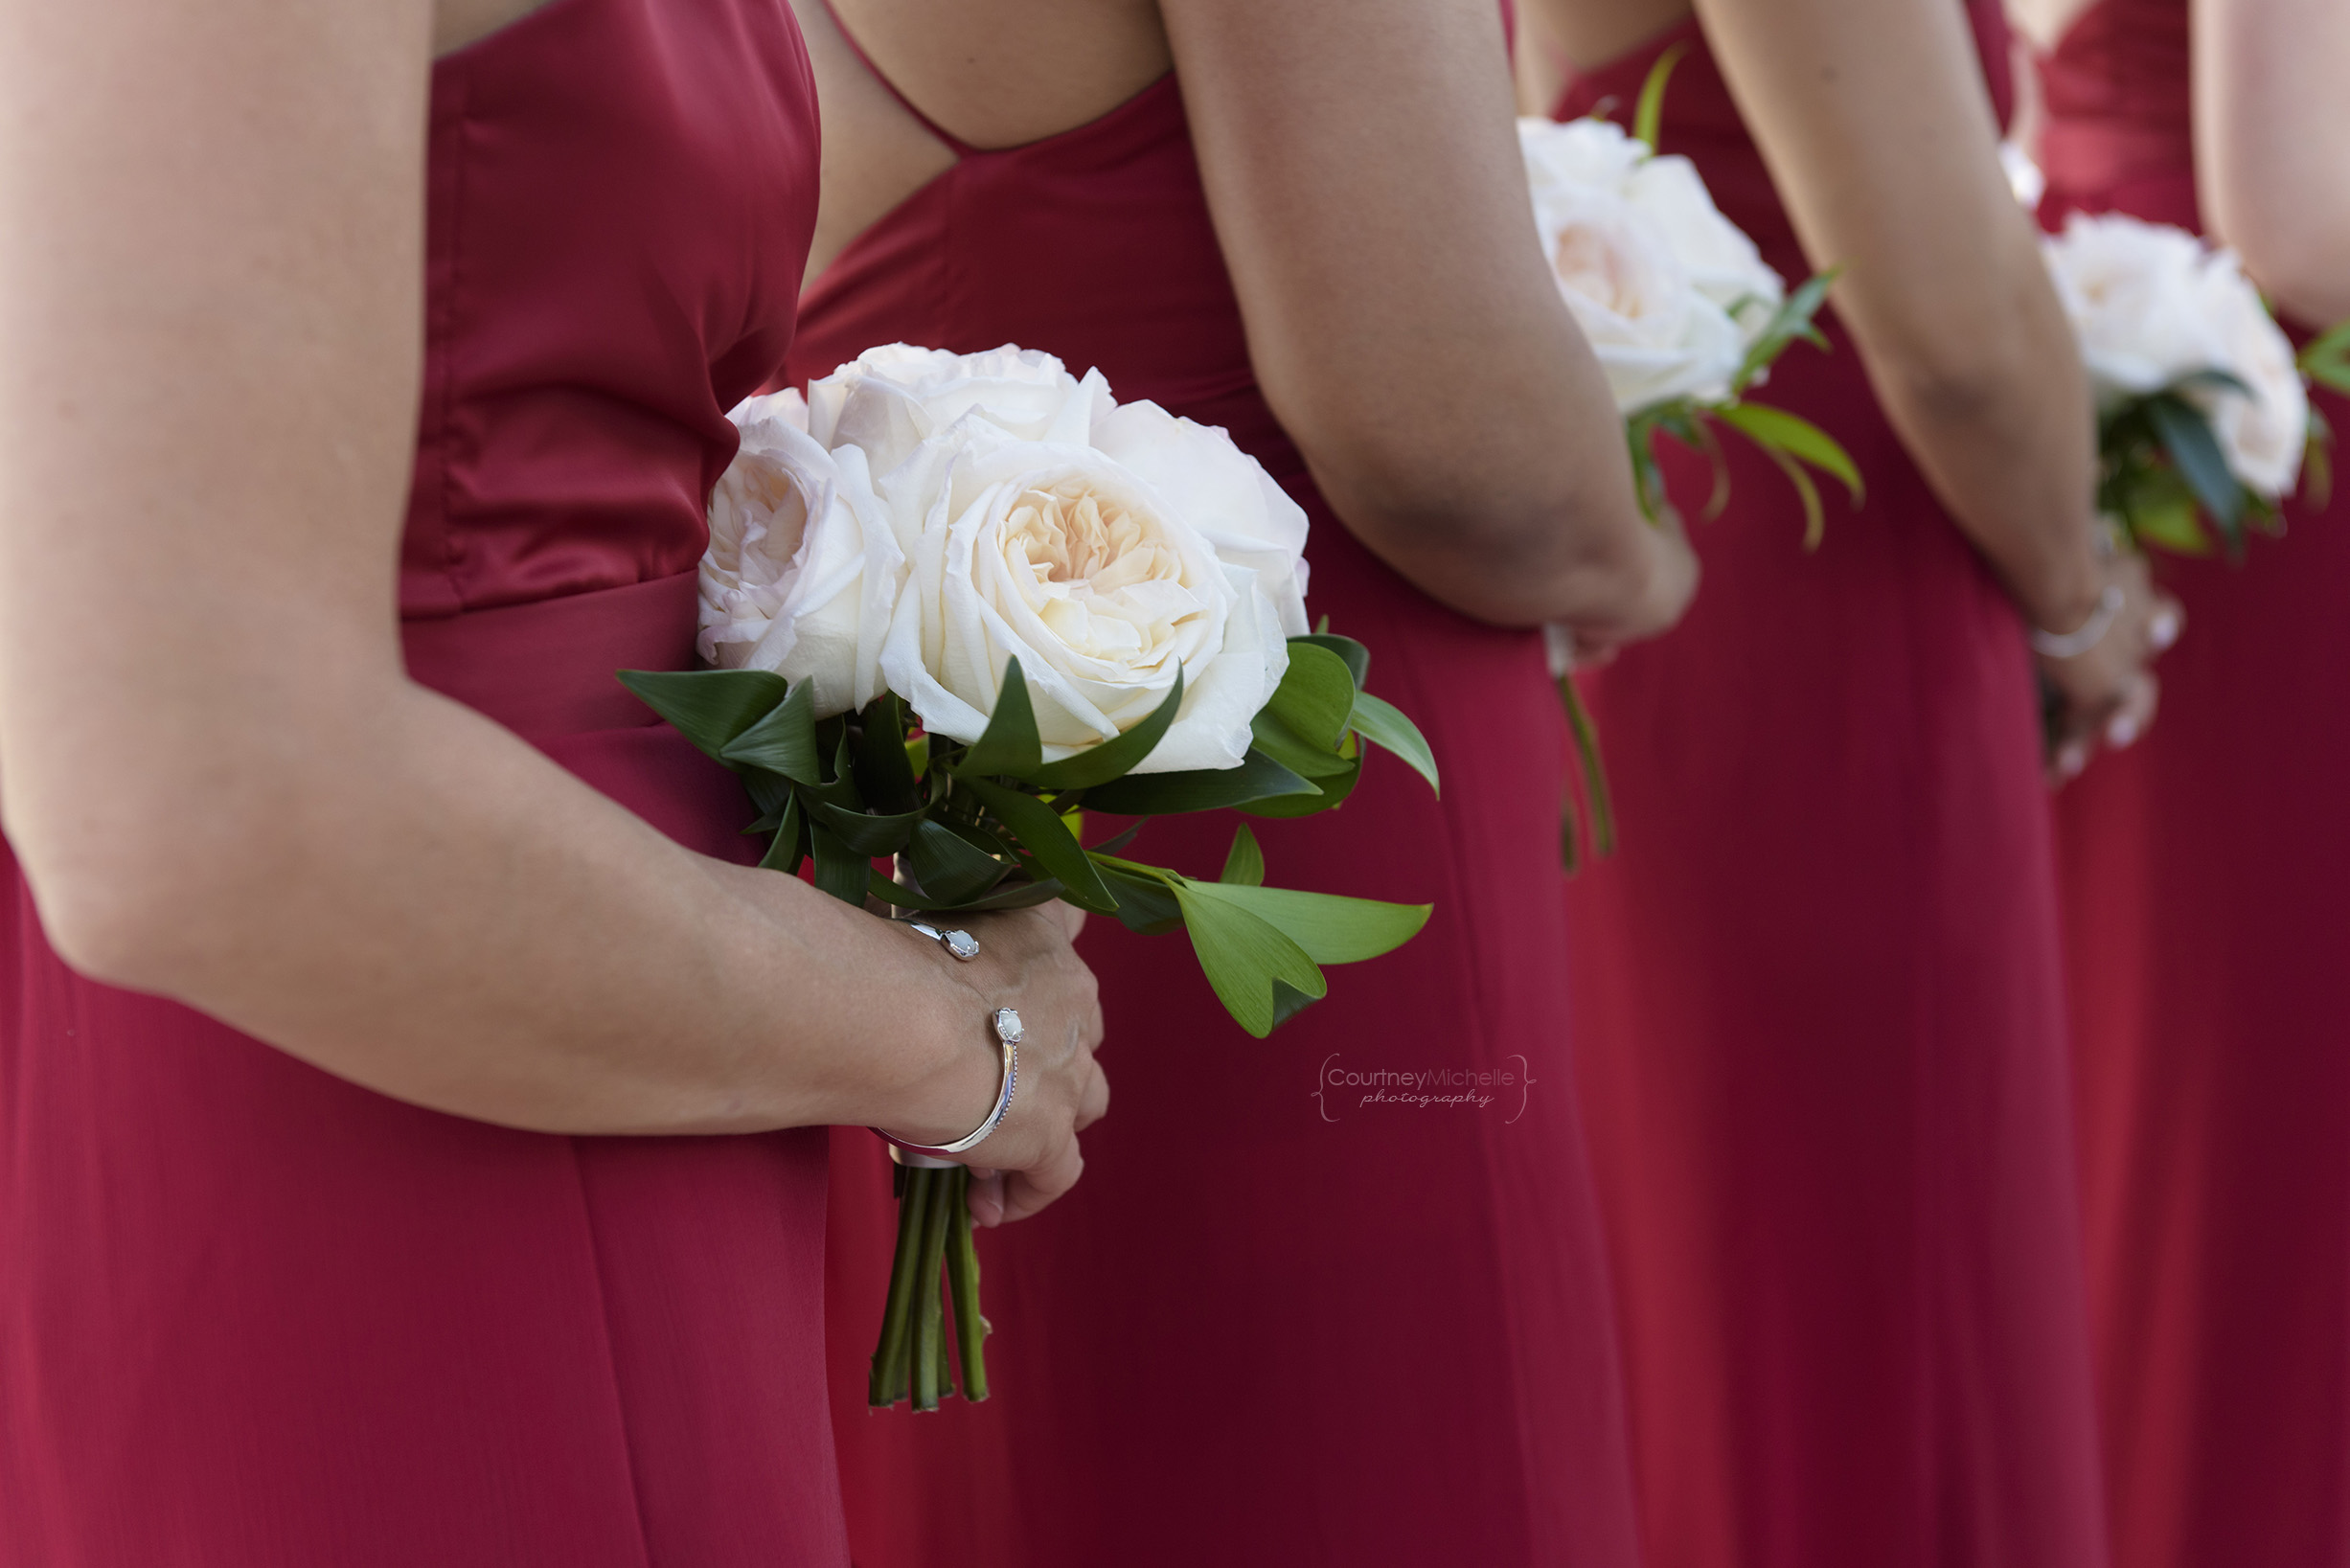 grand-cayman-beach-wedding-photography-by-courtney-laper©CopyrightCMP-LeaAnneRaj-7726.jpg